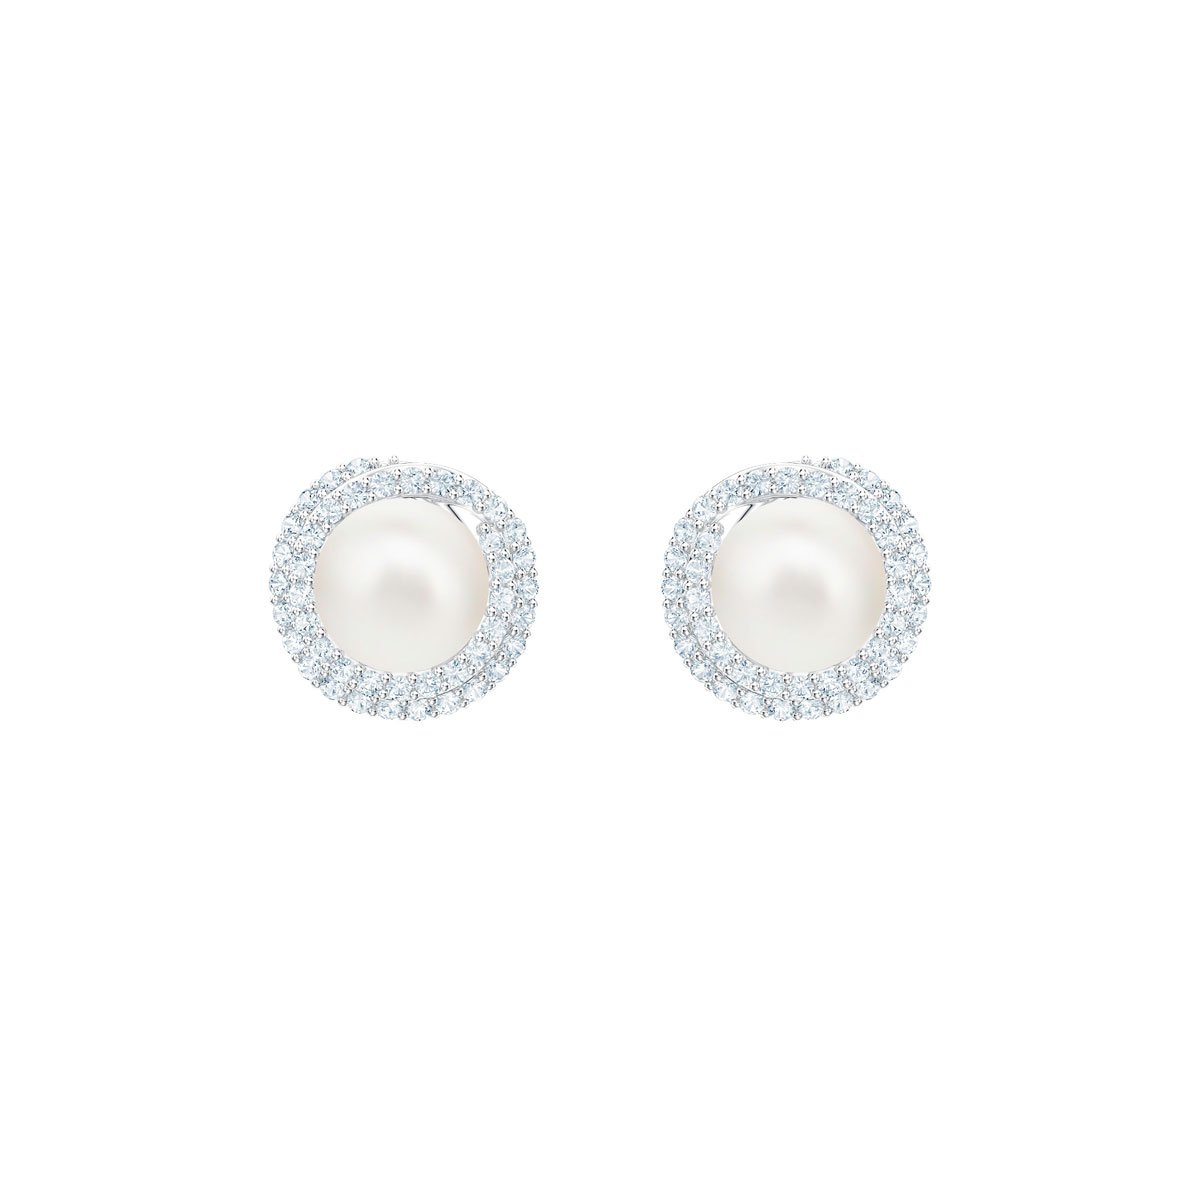 Swarovski Originally Pierced Earrings, White, Rhodium